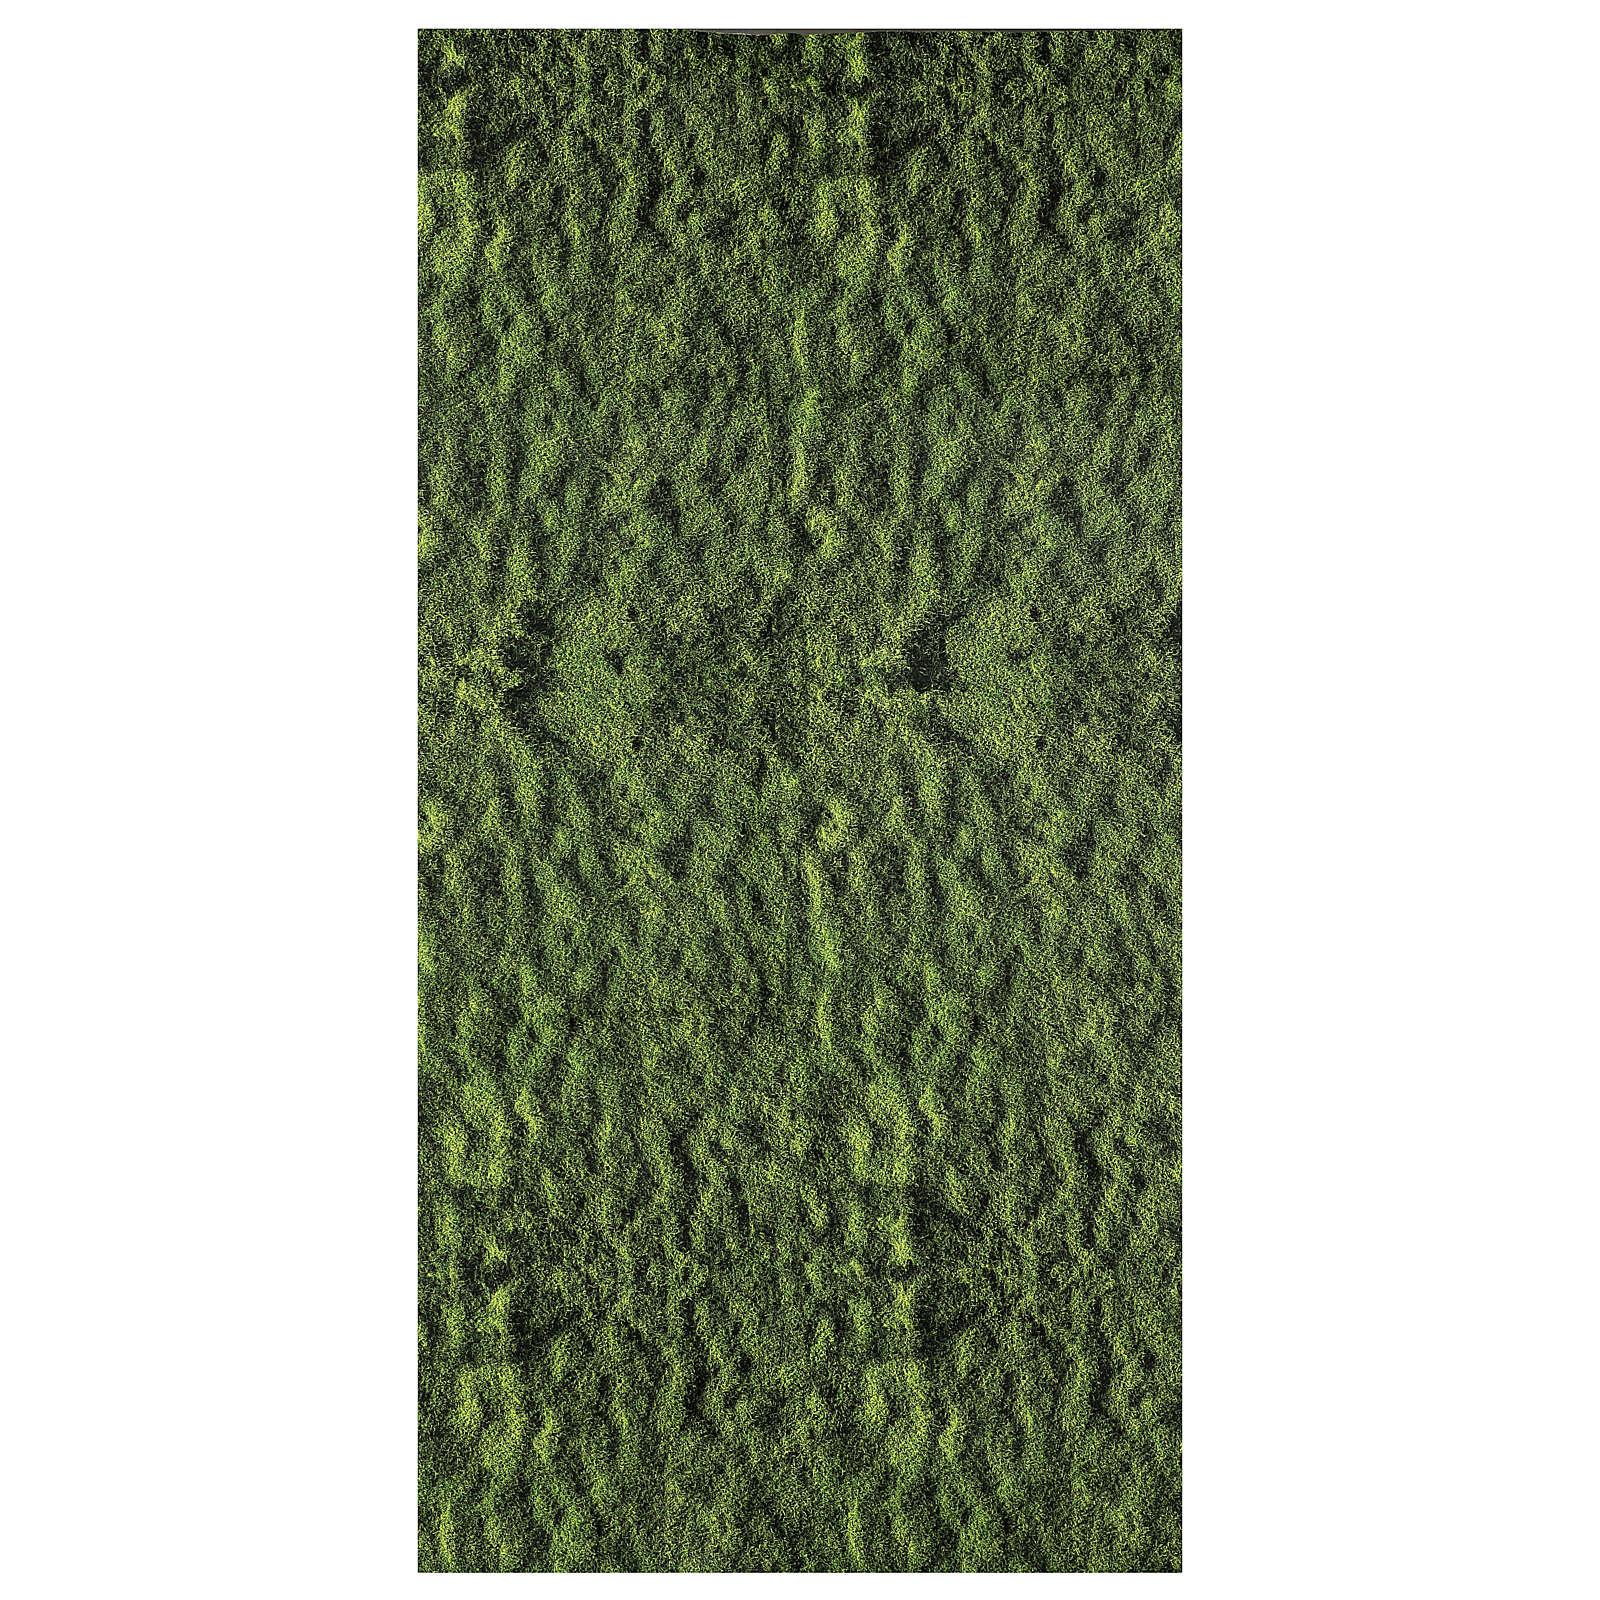 Carta muschio modellabile 120x60 cm per presepe 4